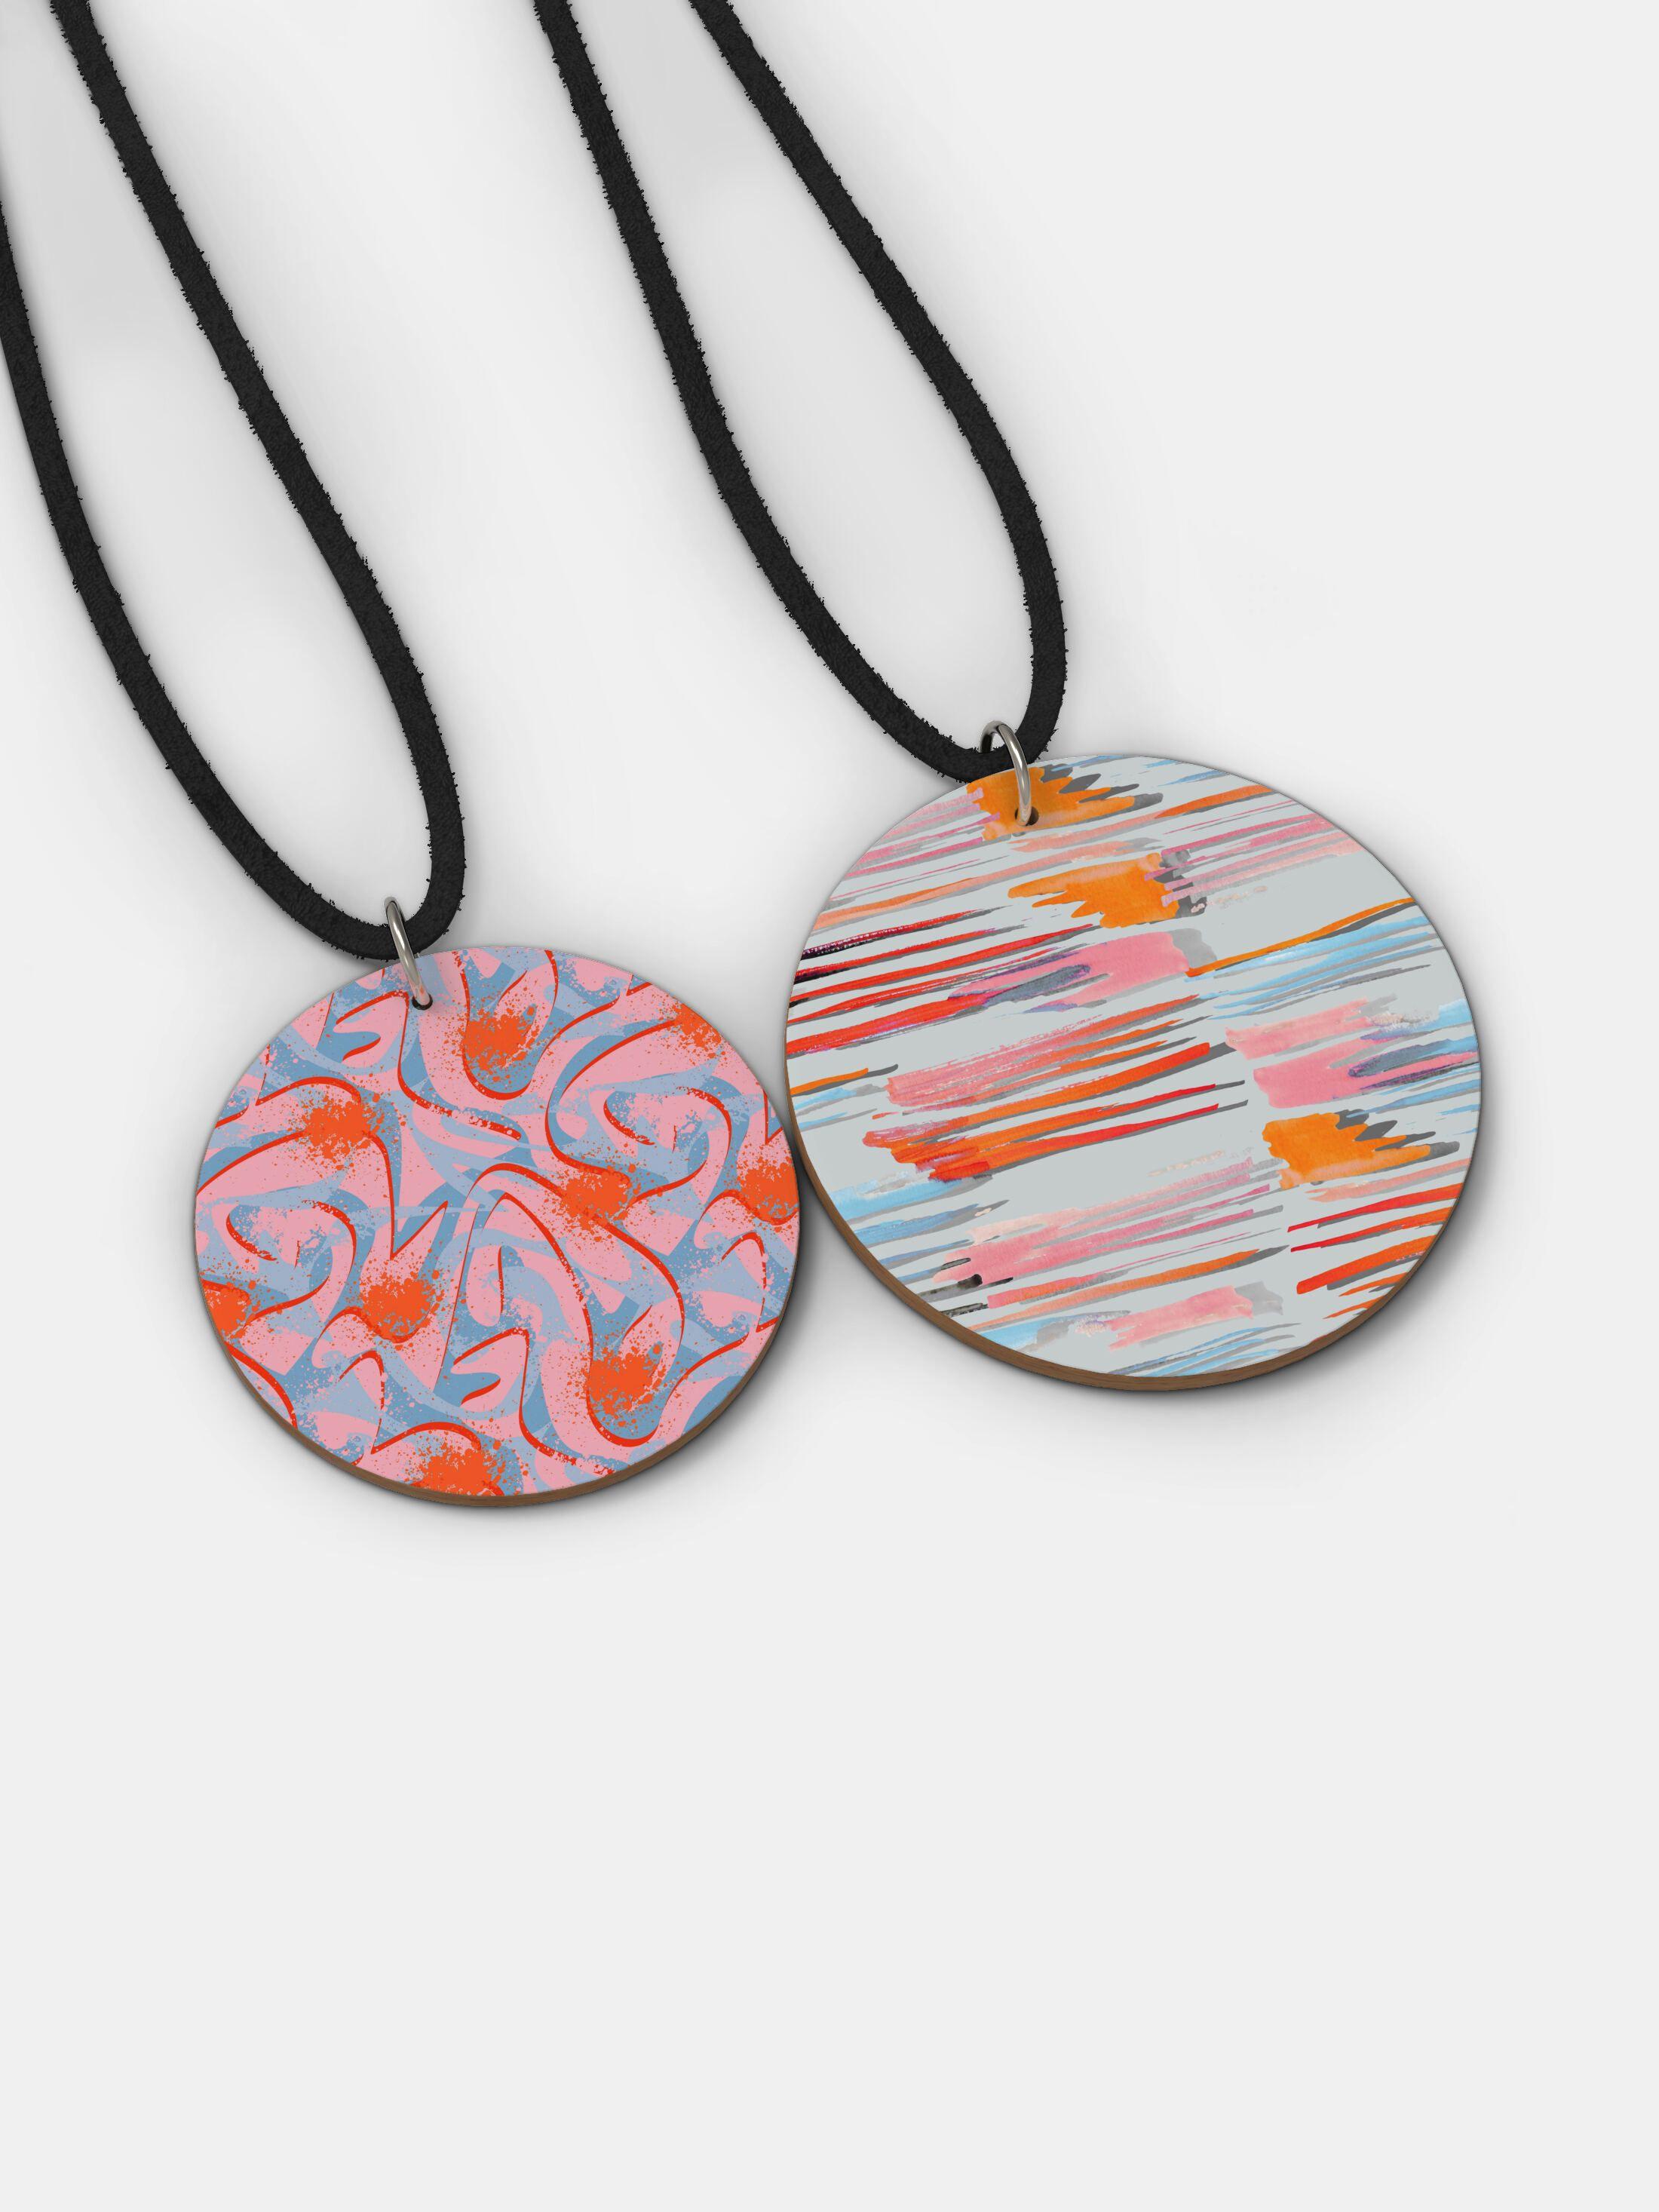 custom printed wood pendant necklace